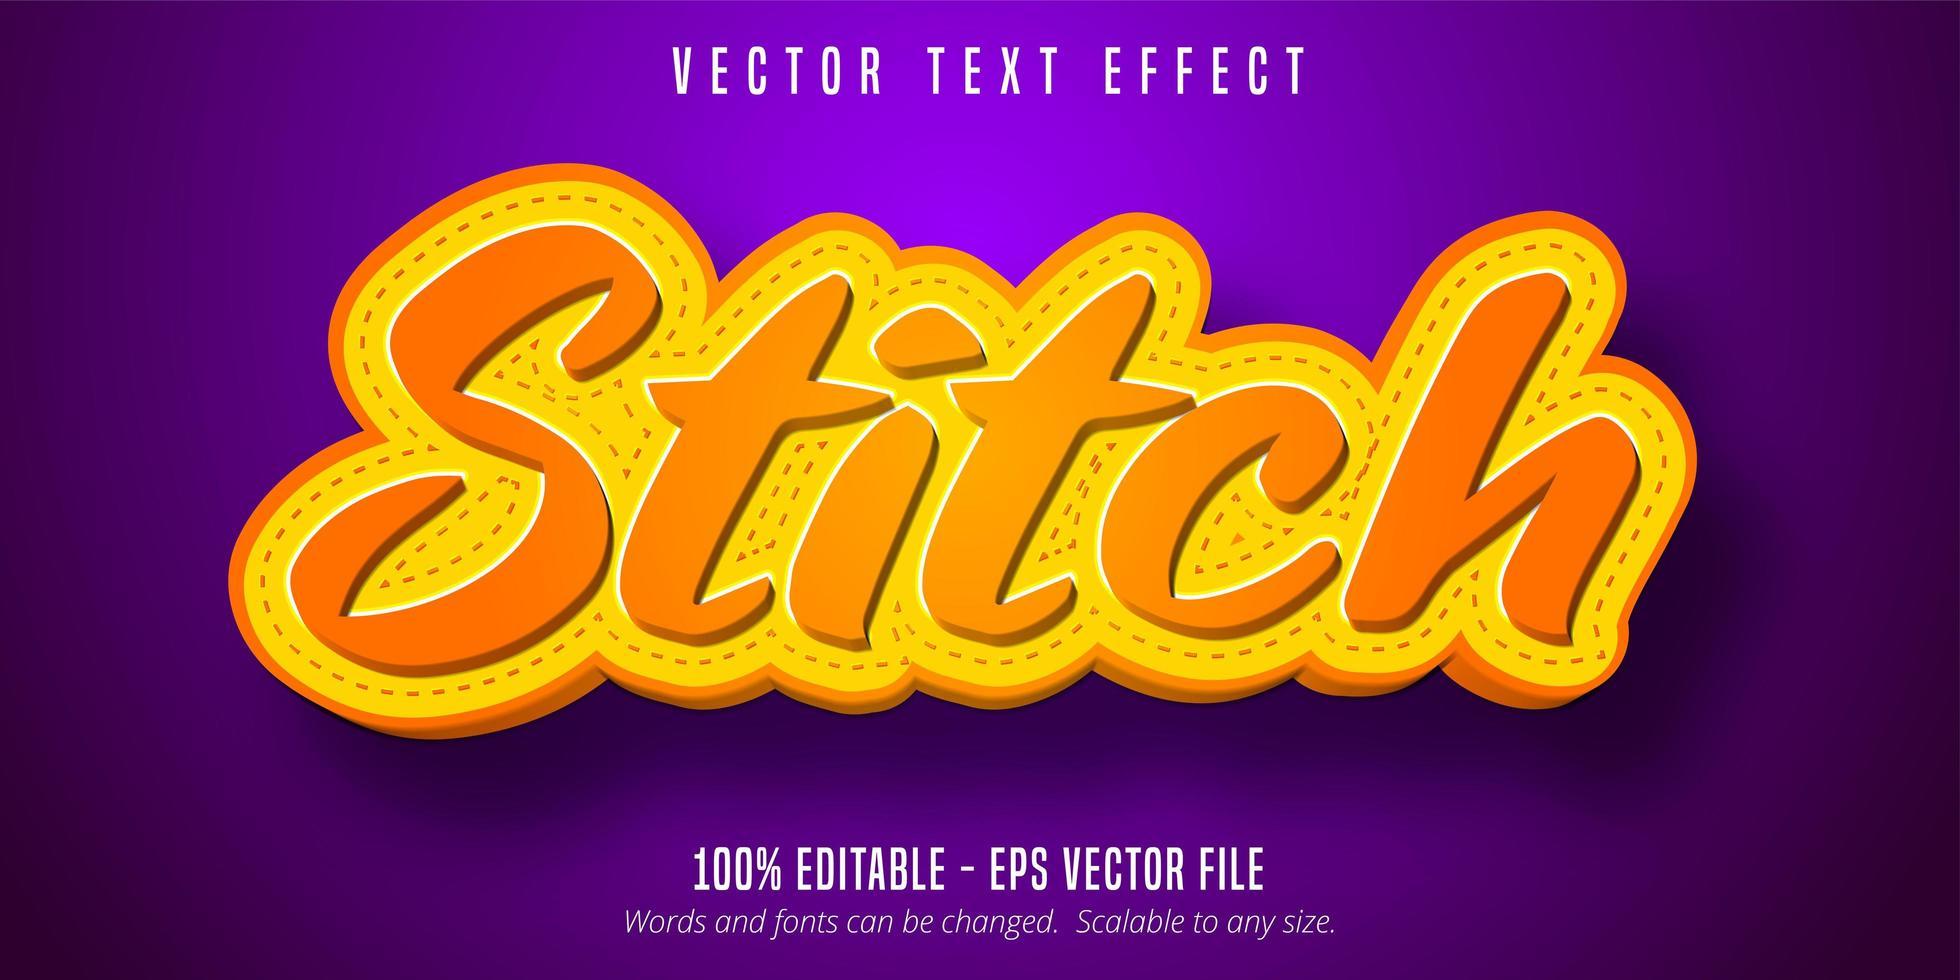 Stitch-Text-Effekt vektor